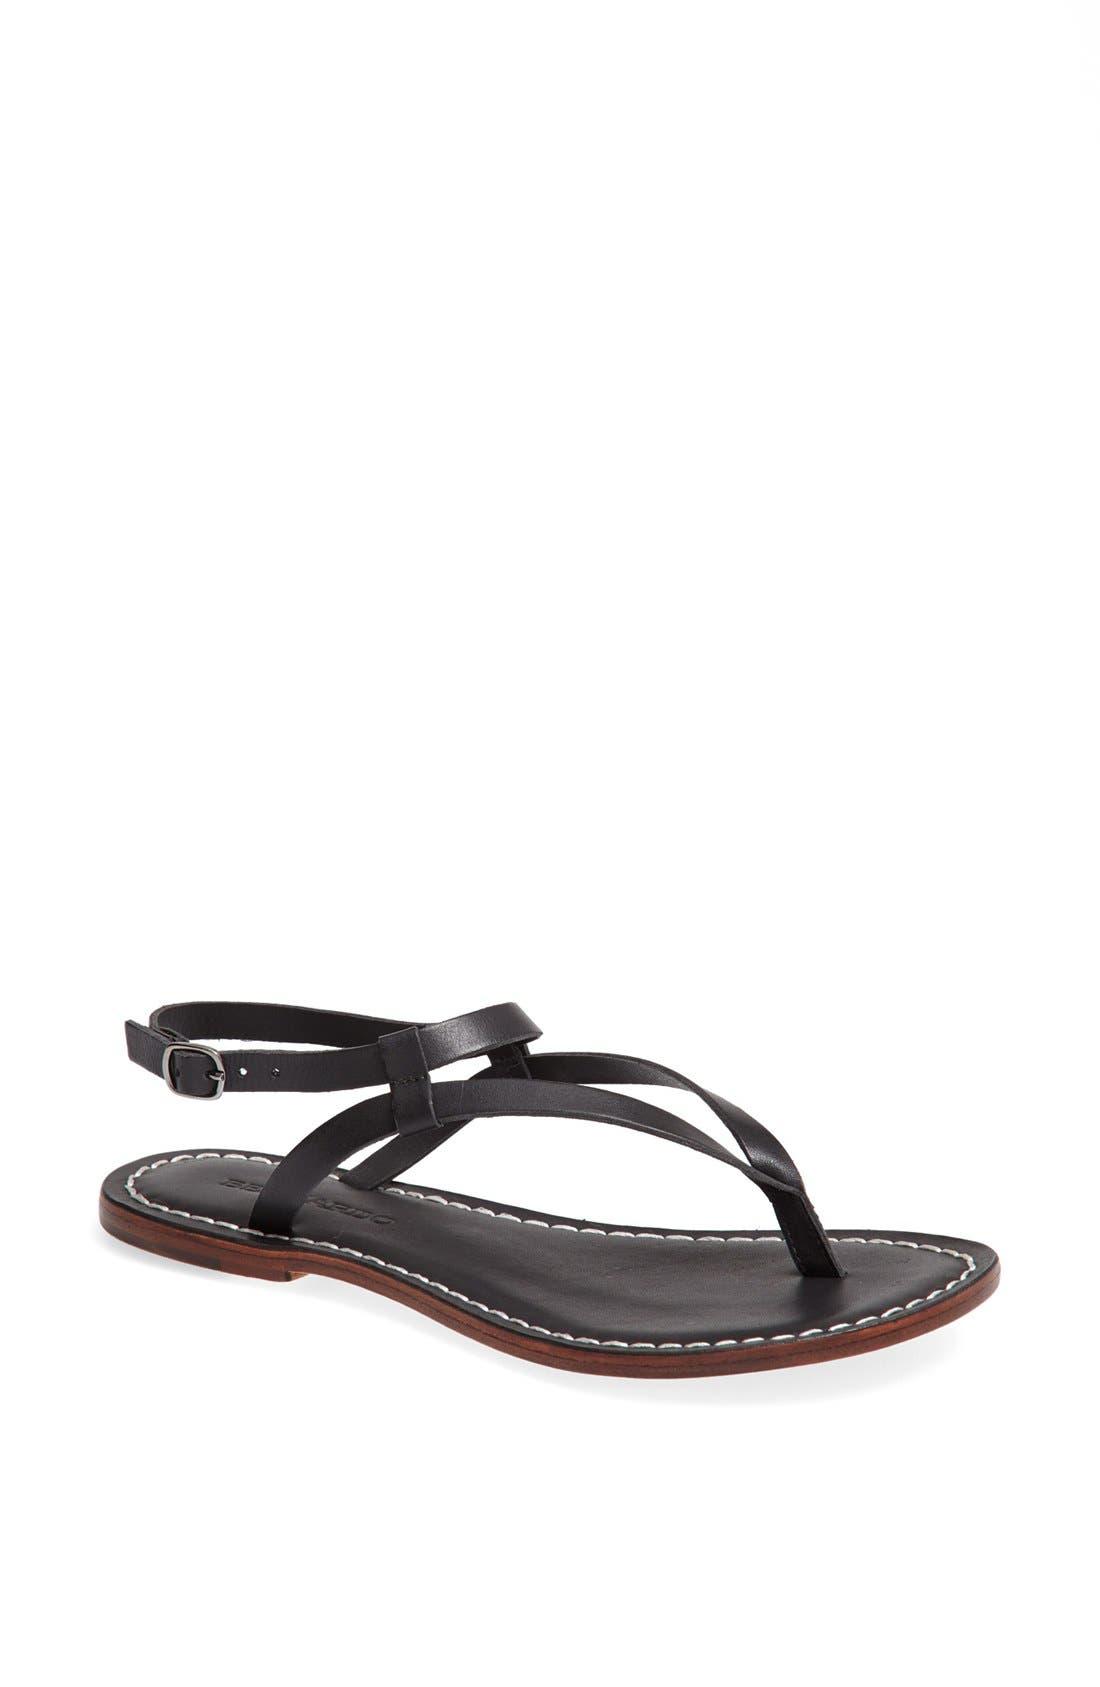 Main Image - Bernardo Footwear Merit Thong Sandal